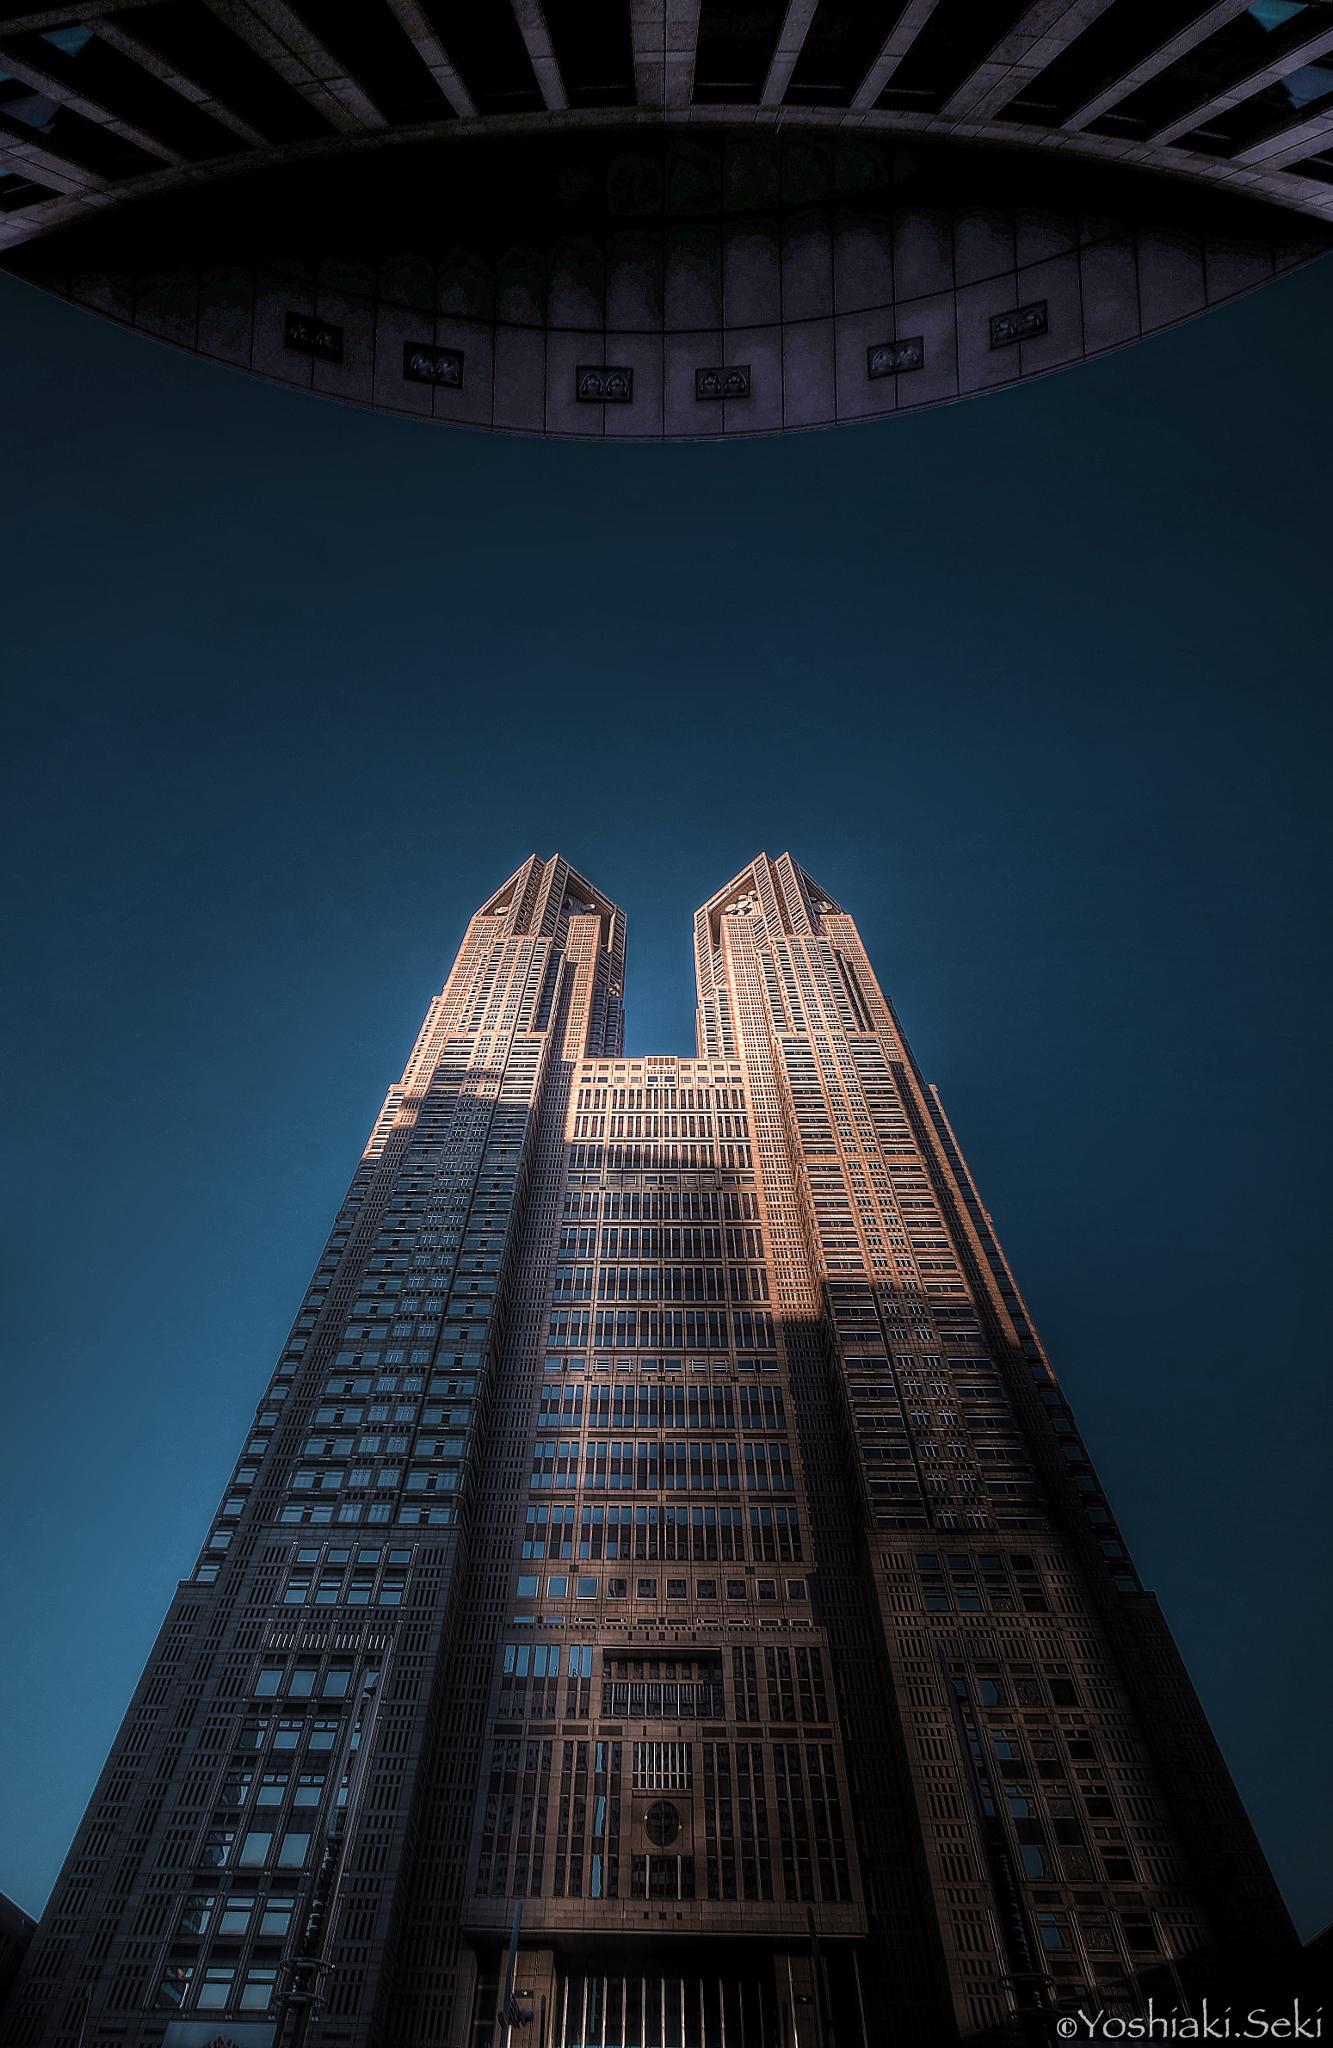 Tokyo Metropolitan Government at sunrise by Yoshiaki Seki